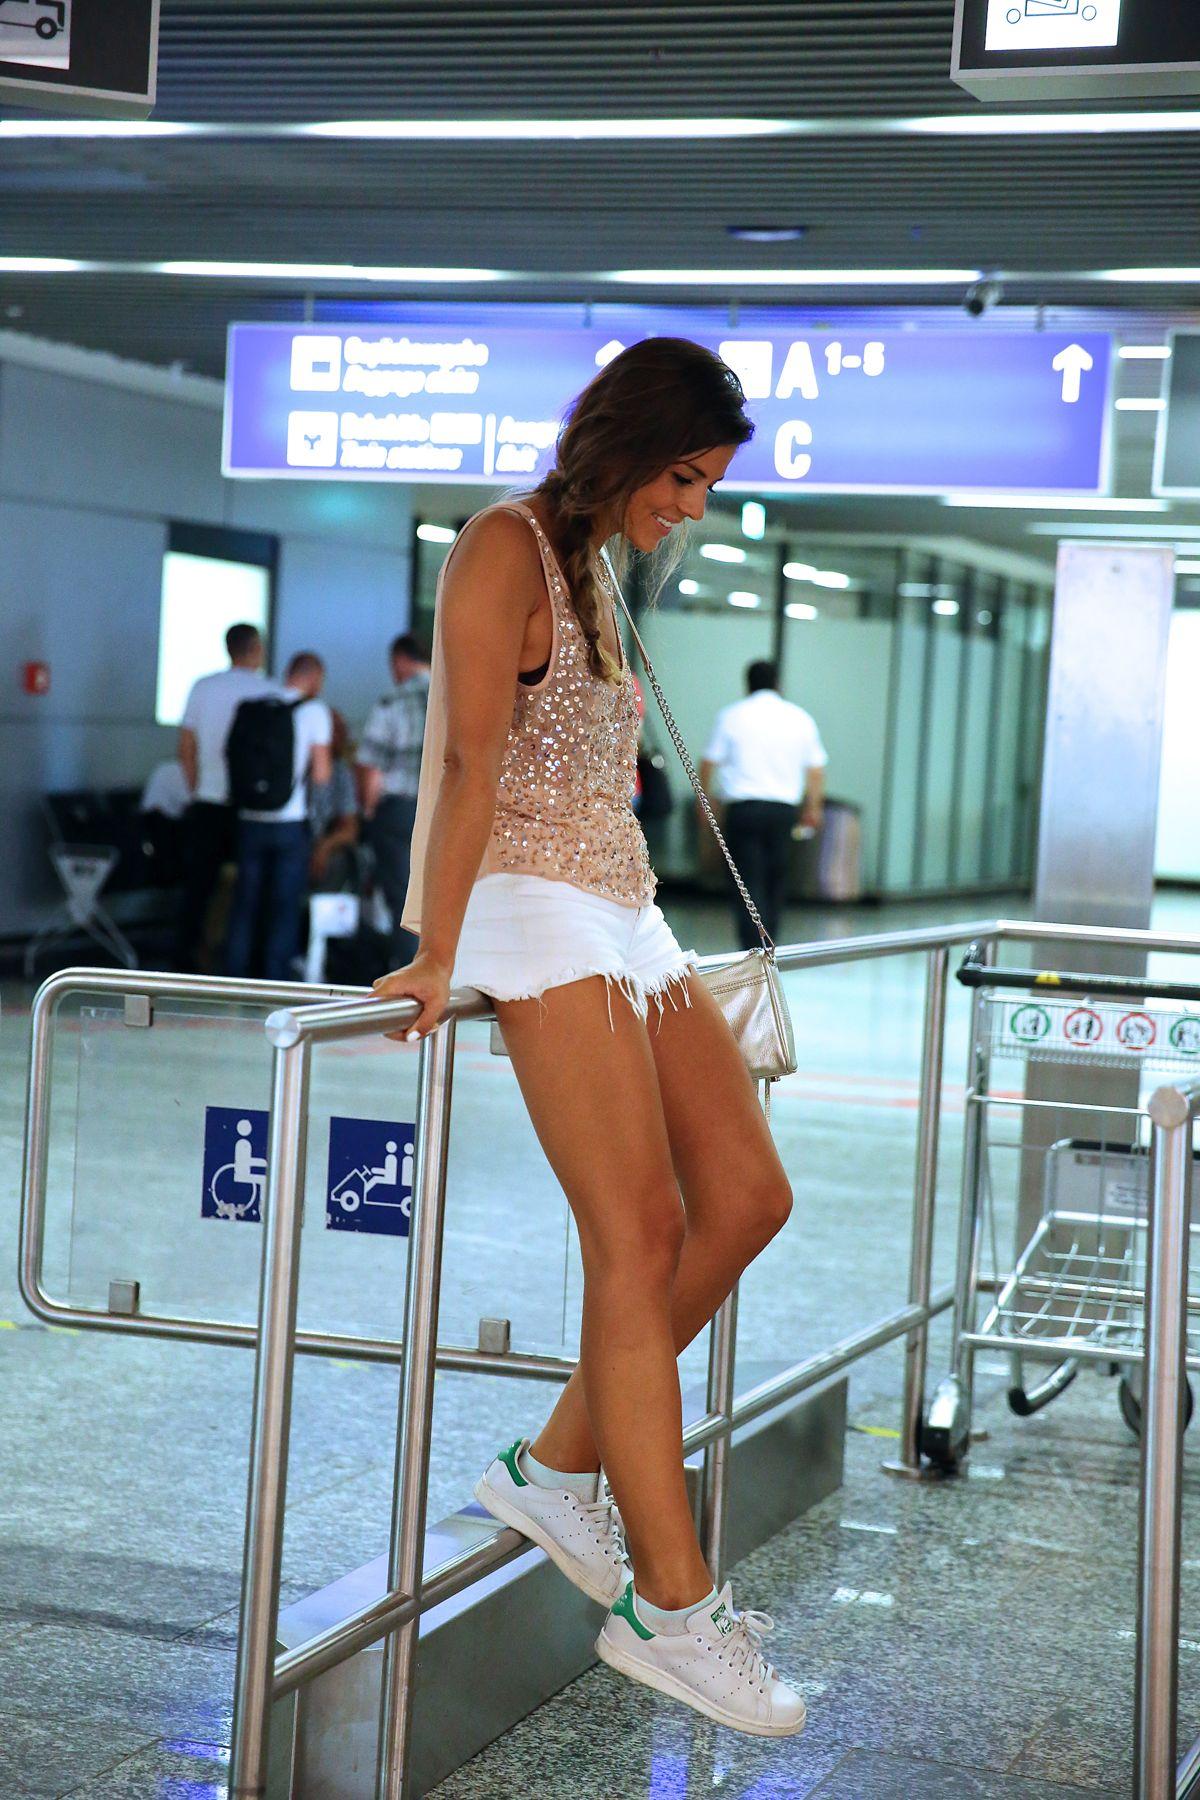 trendy_taste-look-outfit-street_style-ootd-blog-blogger-fashion_spain-moda_españa-traveling-viaje-frankfurt-stan_smith-adidas-lentejuelas-top-denim-shorts-vaqueros_rotos-15